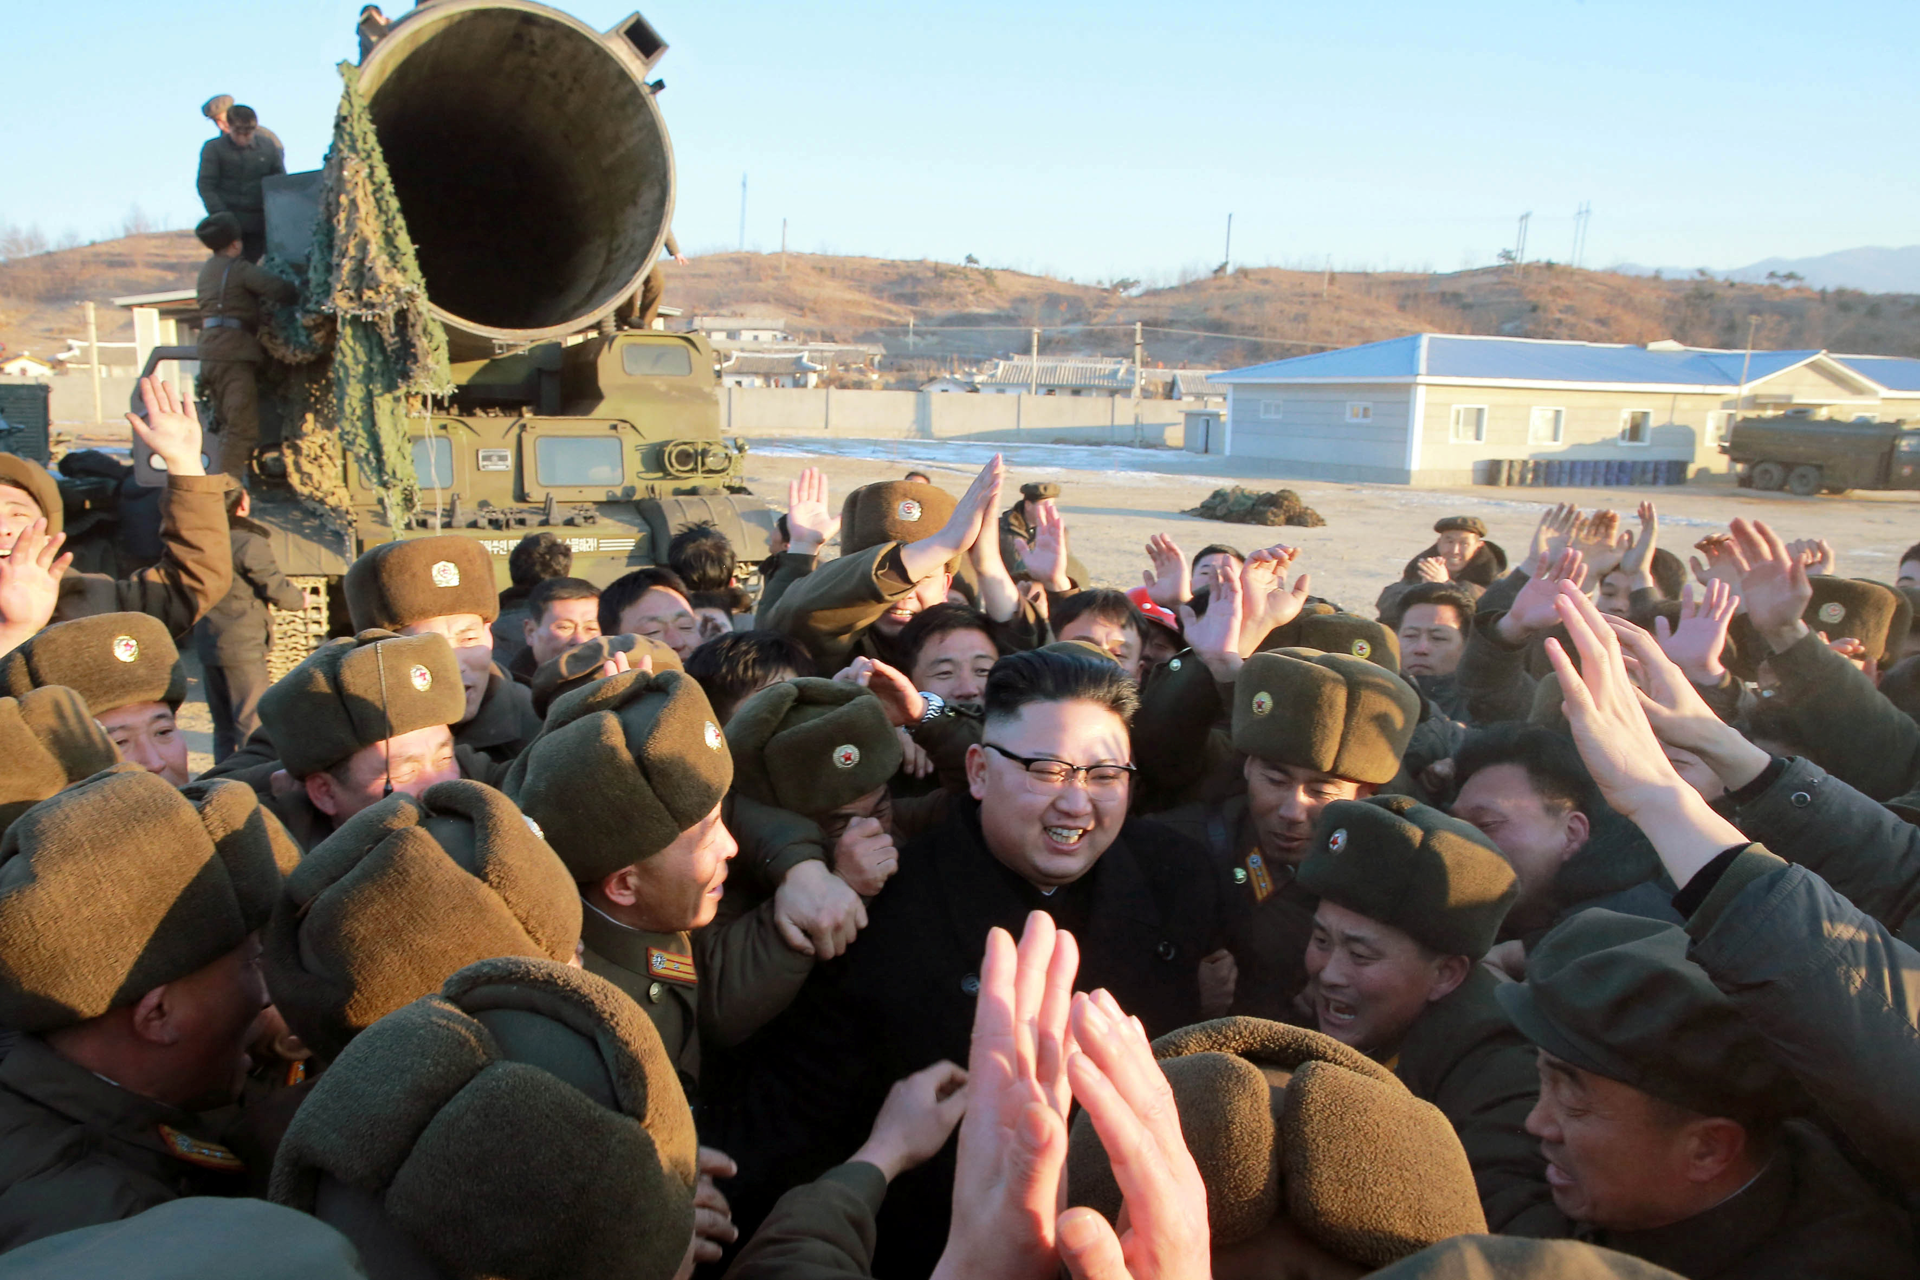 USA voters don't trust Trump when it comes to North Korea